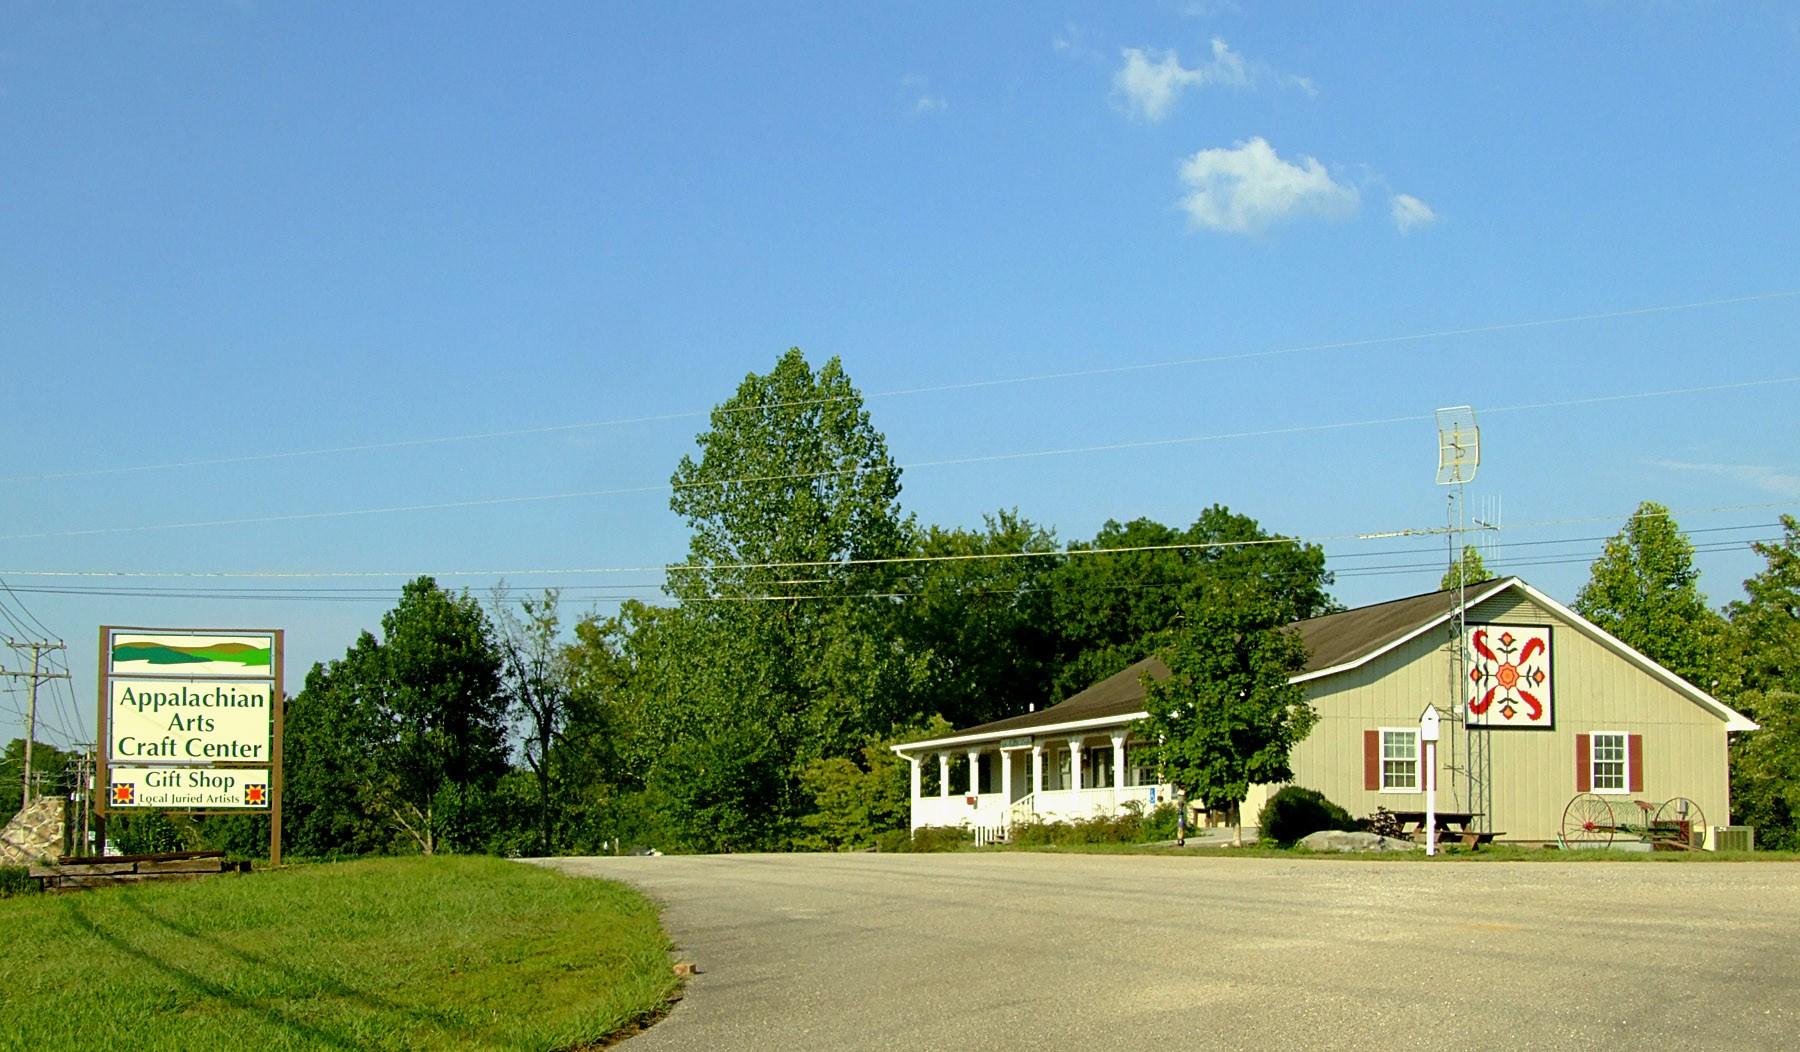 appalachian-arts-craft-center